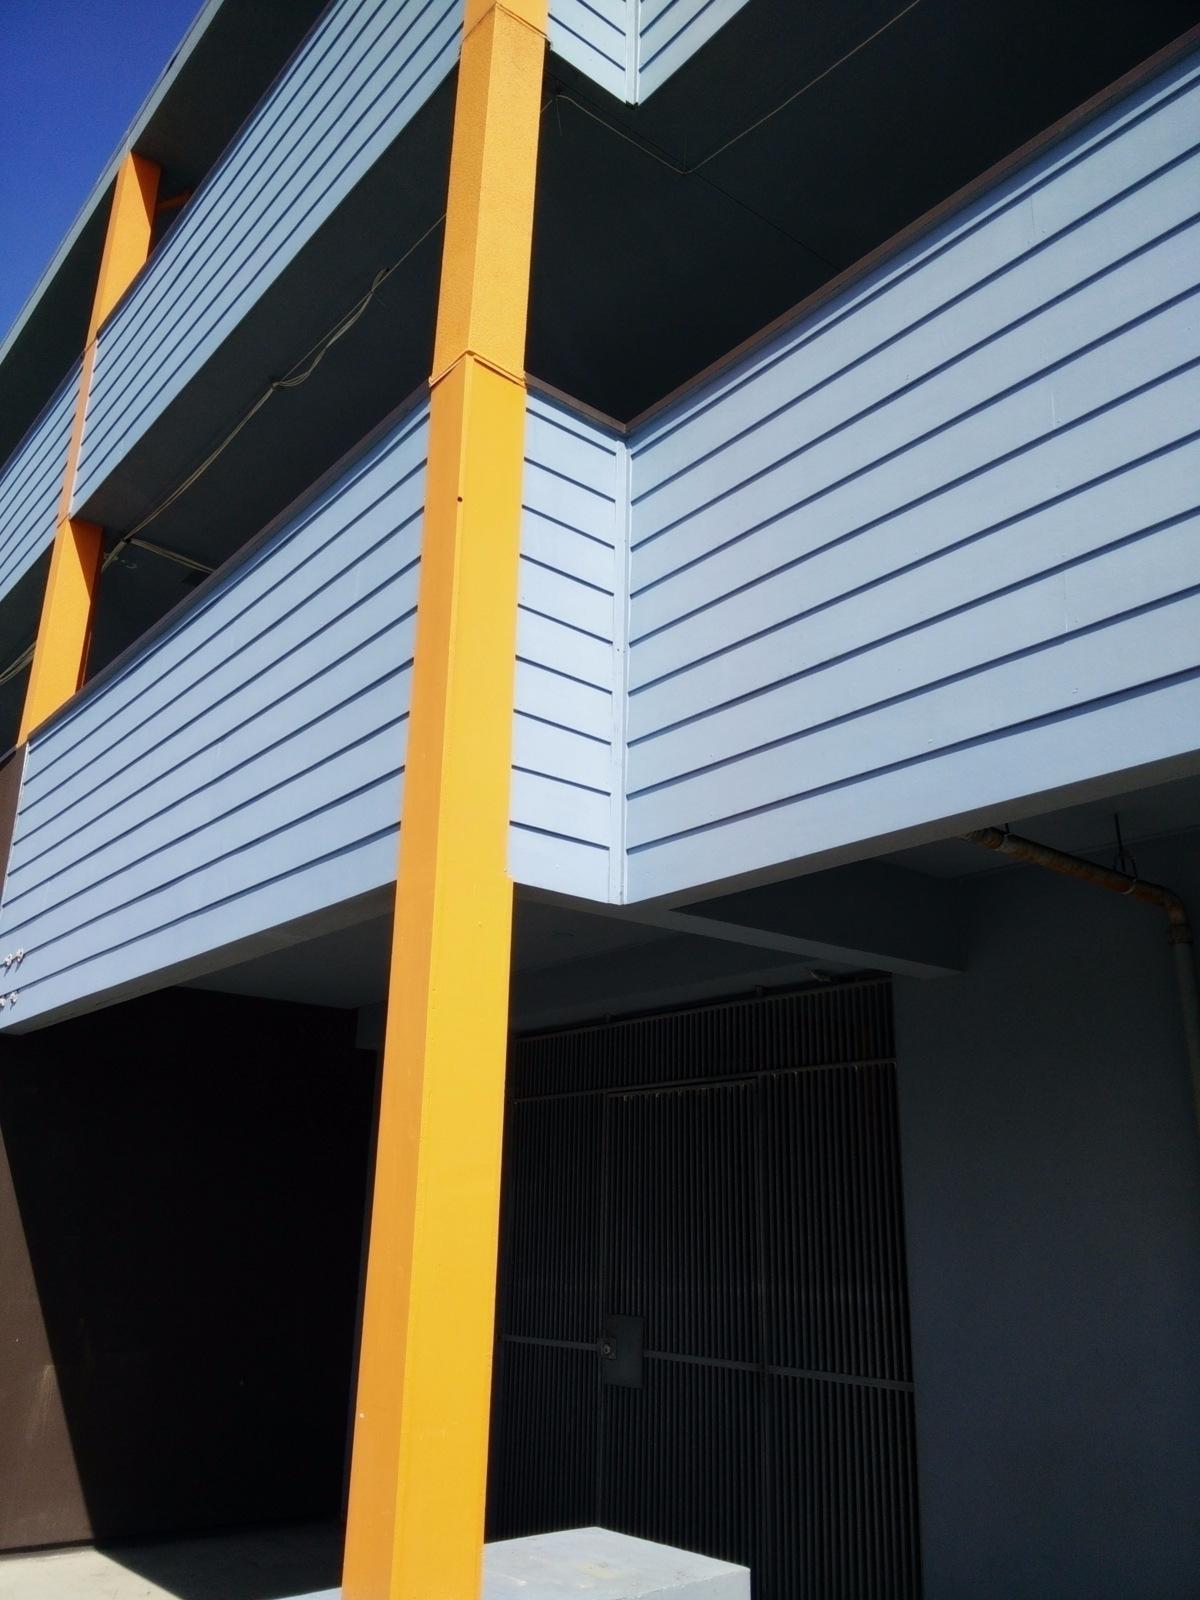 Motel-mania - architecture, minimalism - voiceofsf | ello